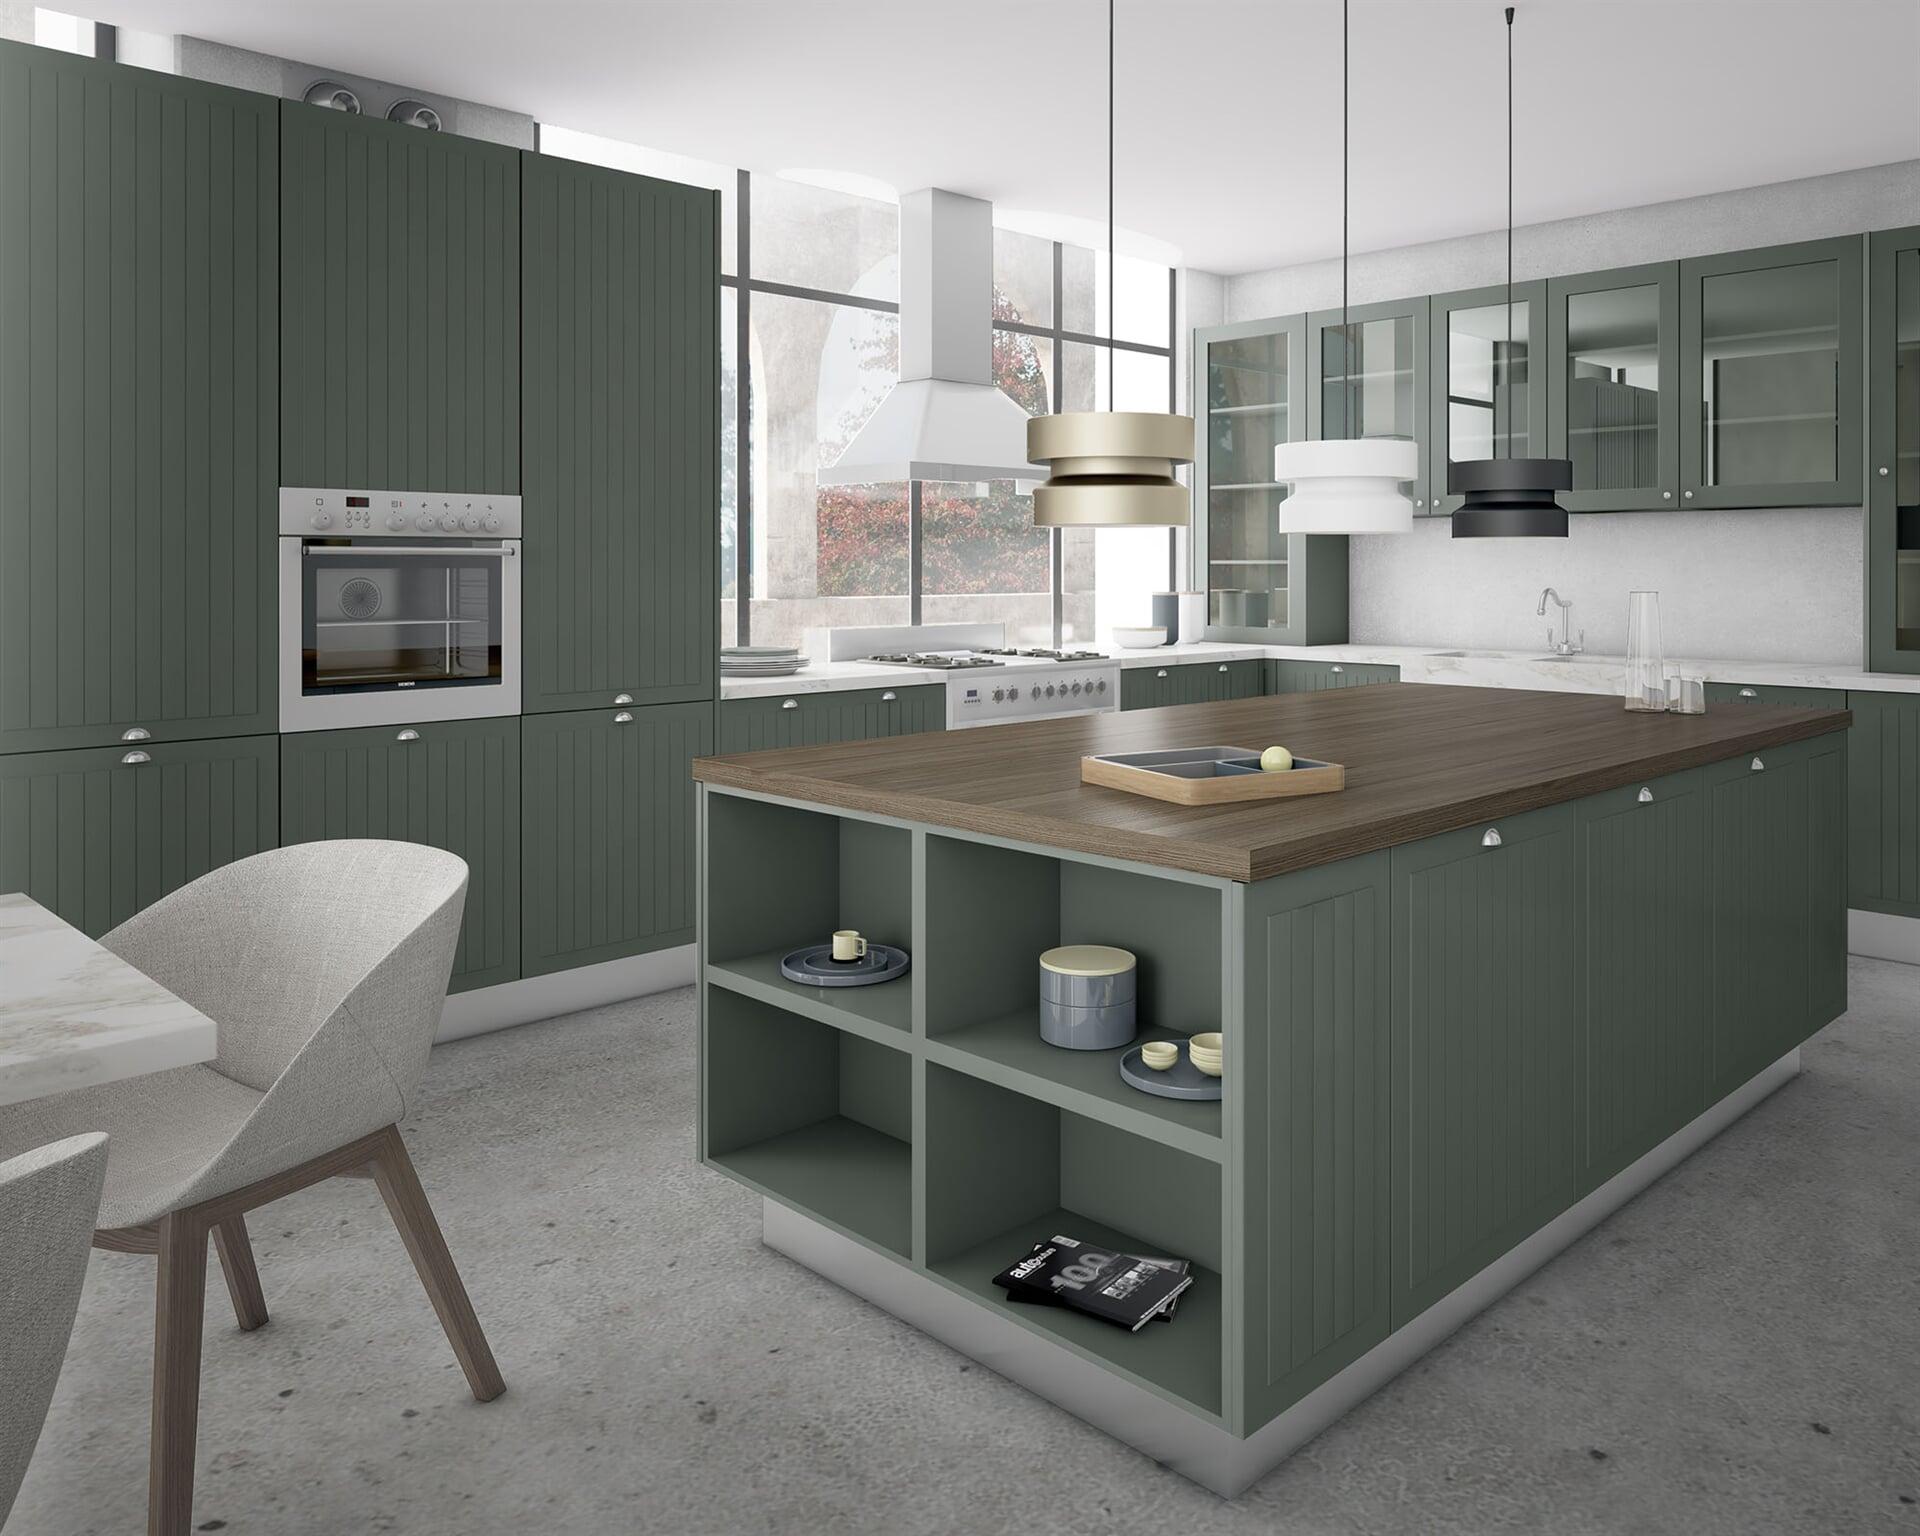 Cozinha Oslo